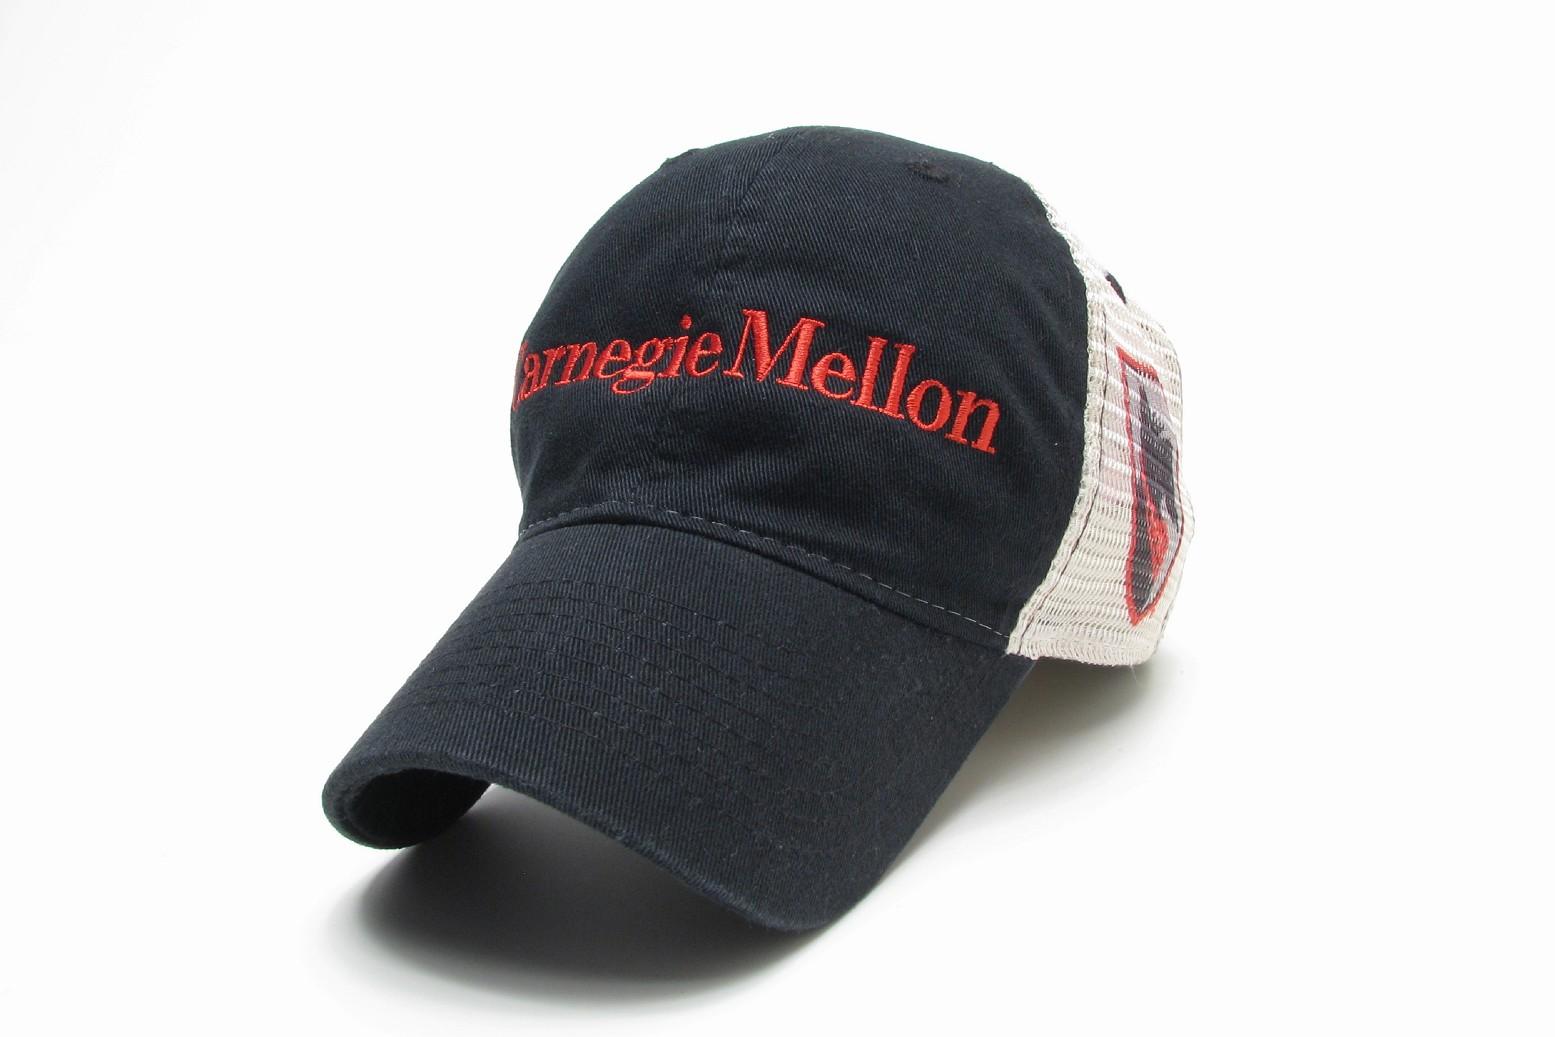 Youth Twill Hat: Black